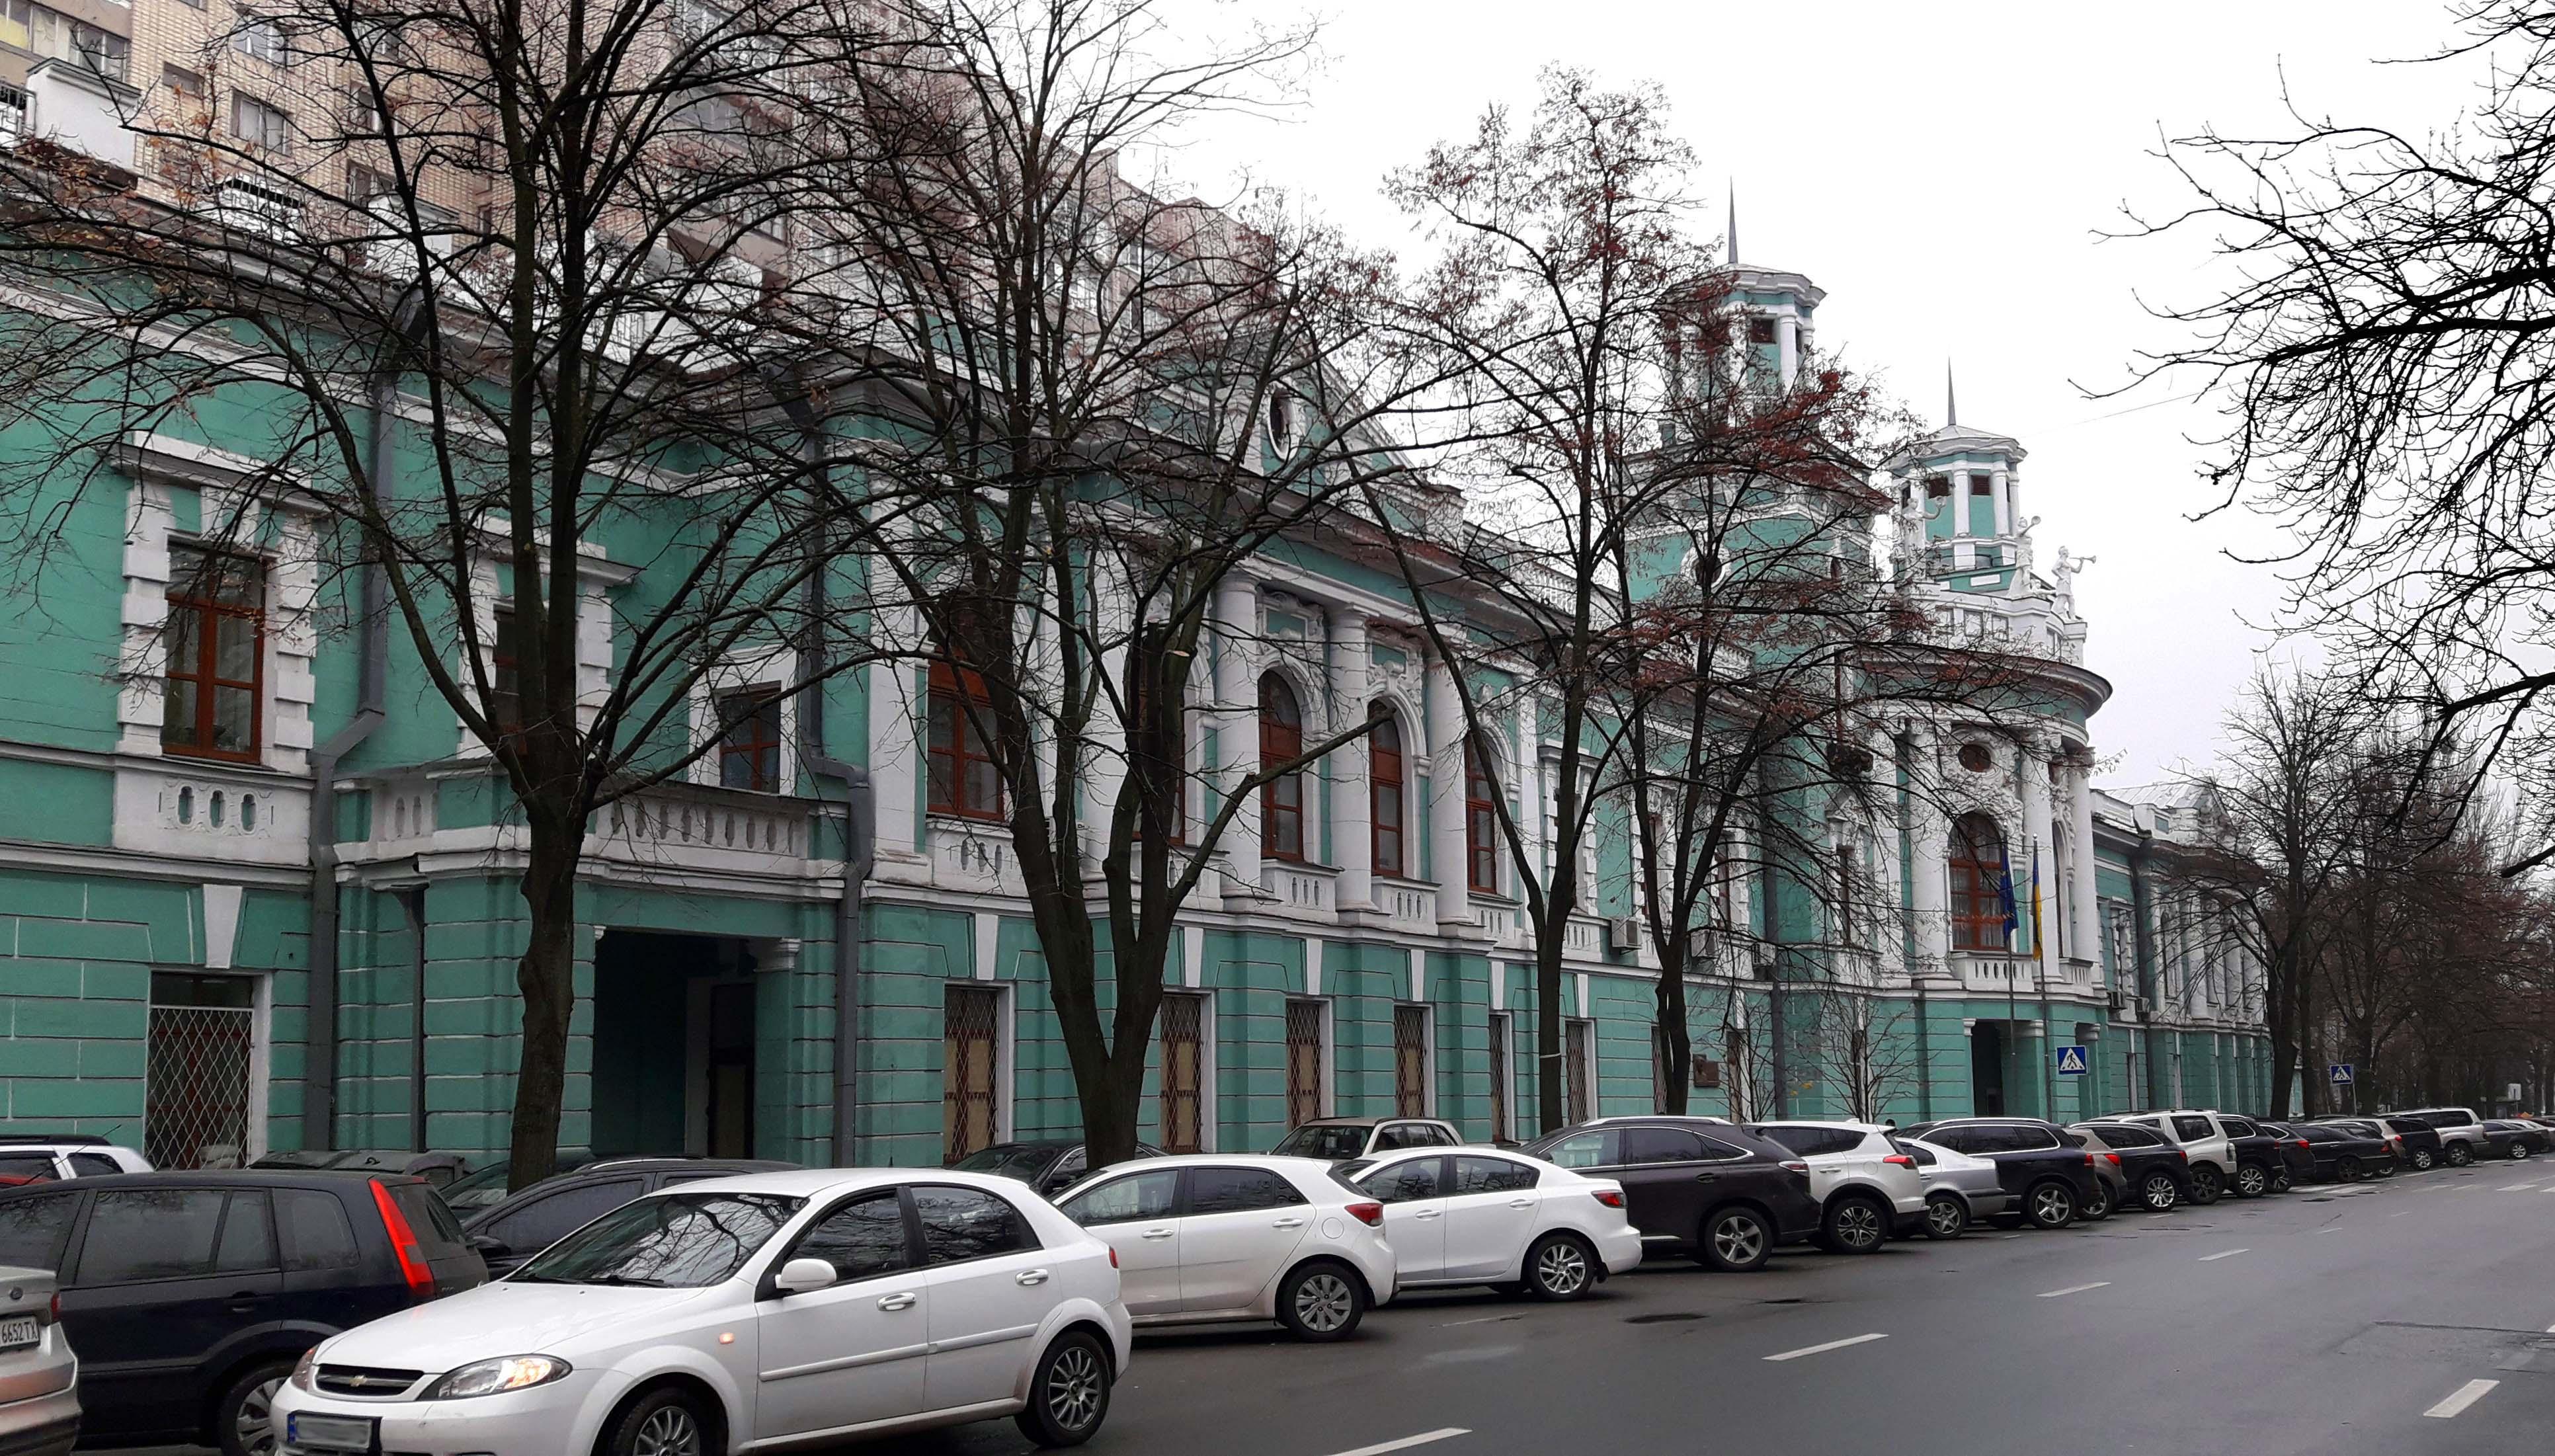 омельяновича-павленко9(1).jpg